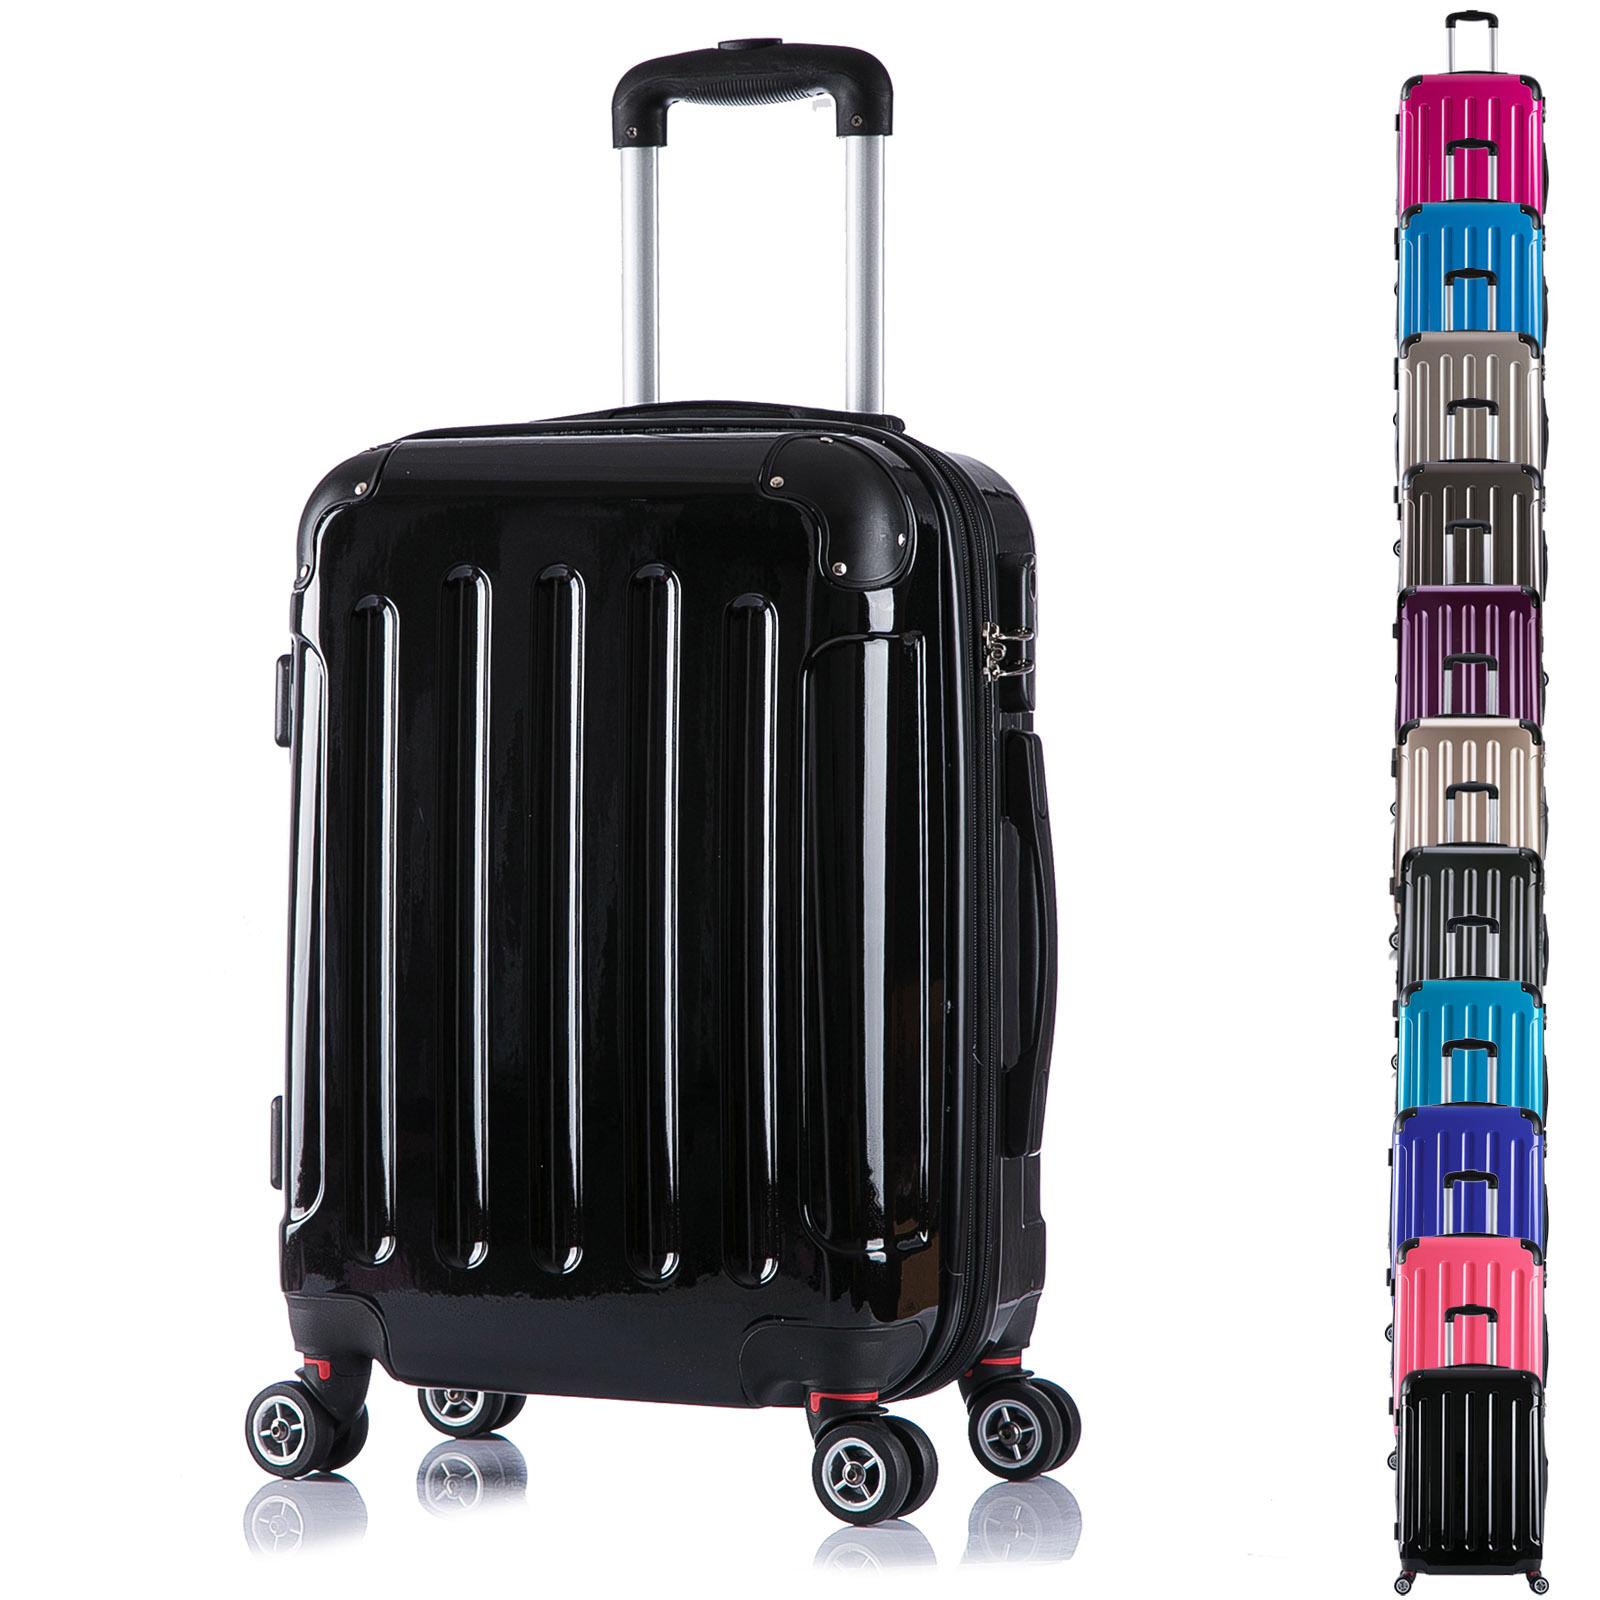 valise cabine rigide bagage de voyage avec 4 roulettes taille m xl f148 ebay. Black Bedroom Furniture Sets. Home Design Ideas